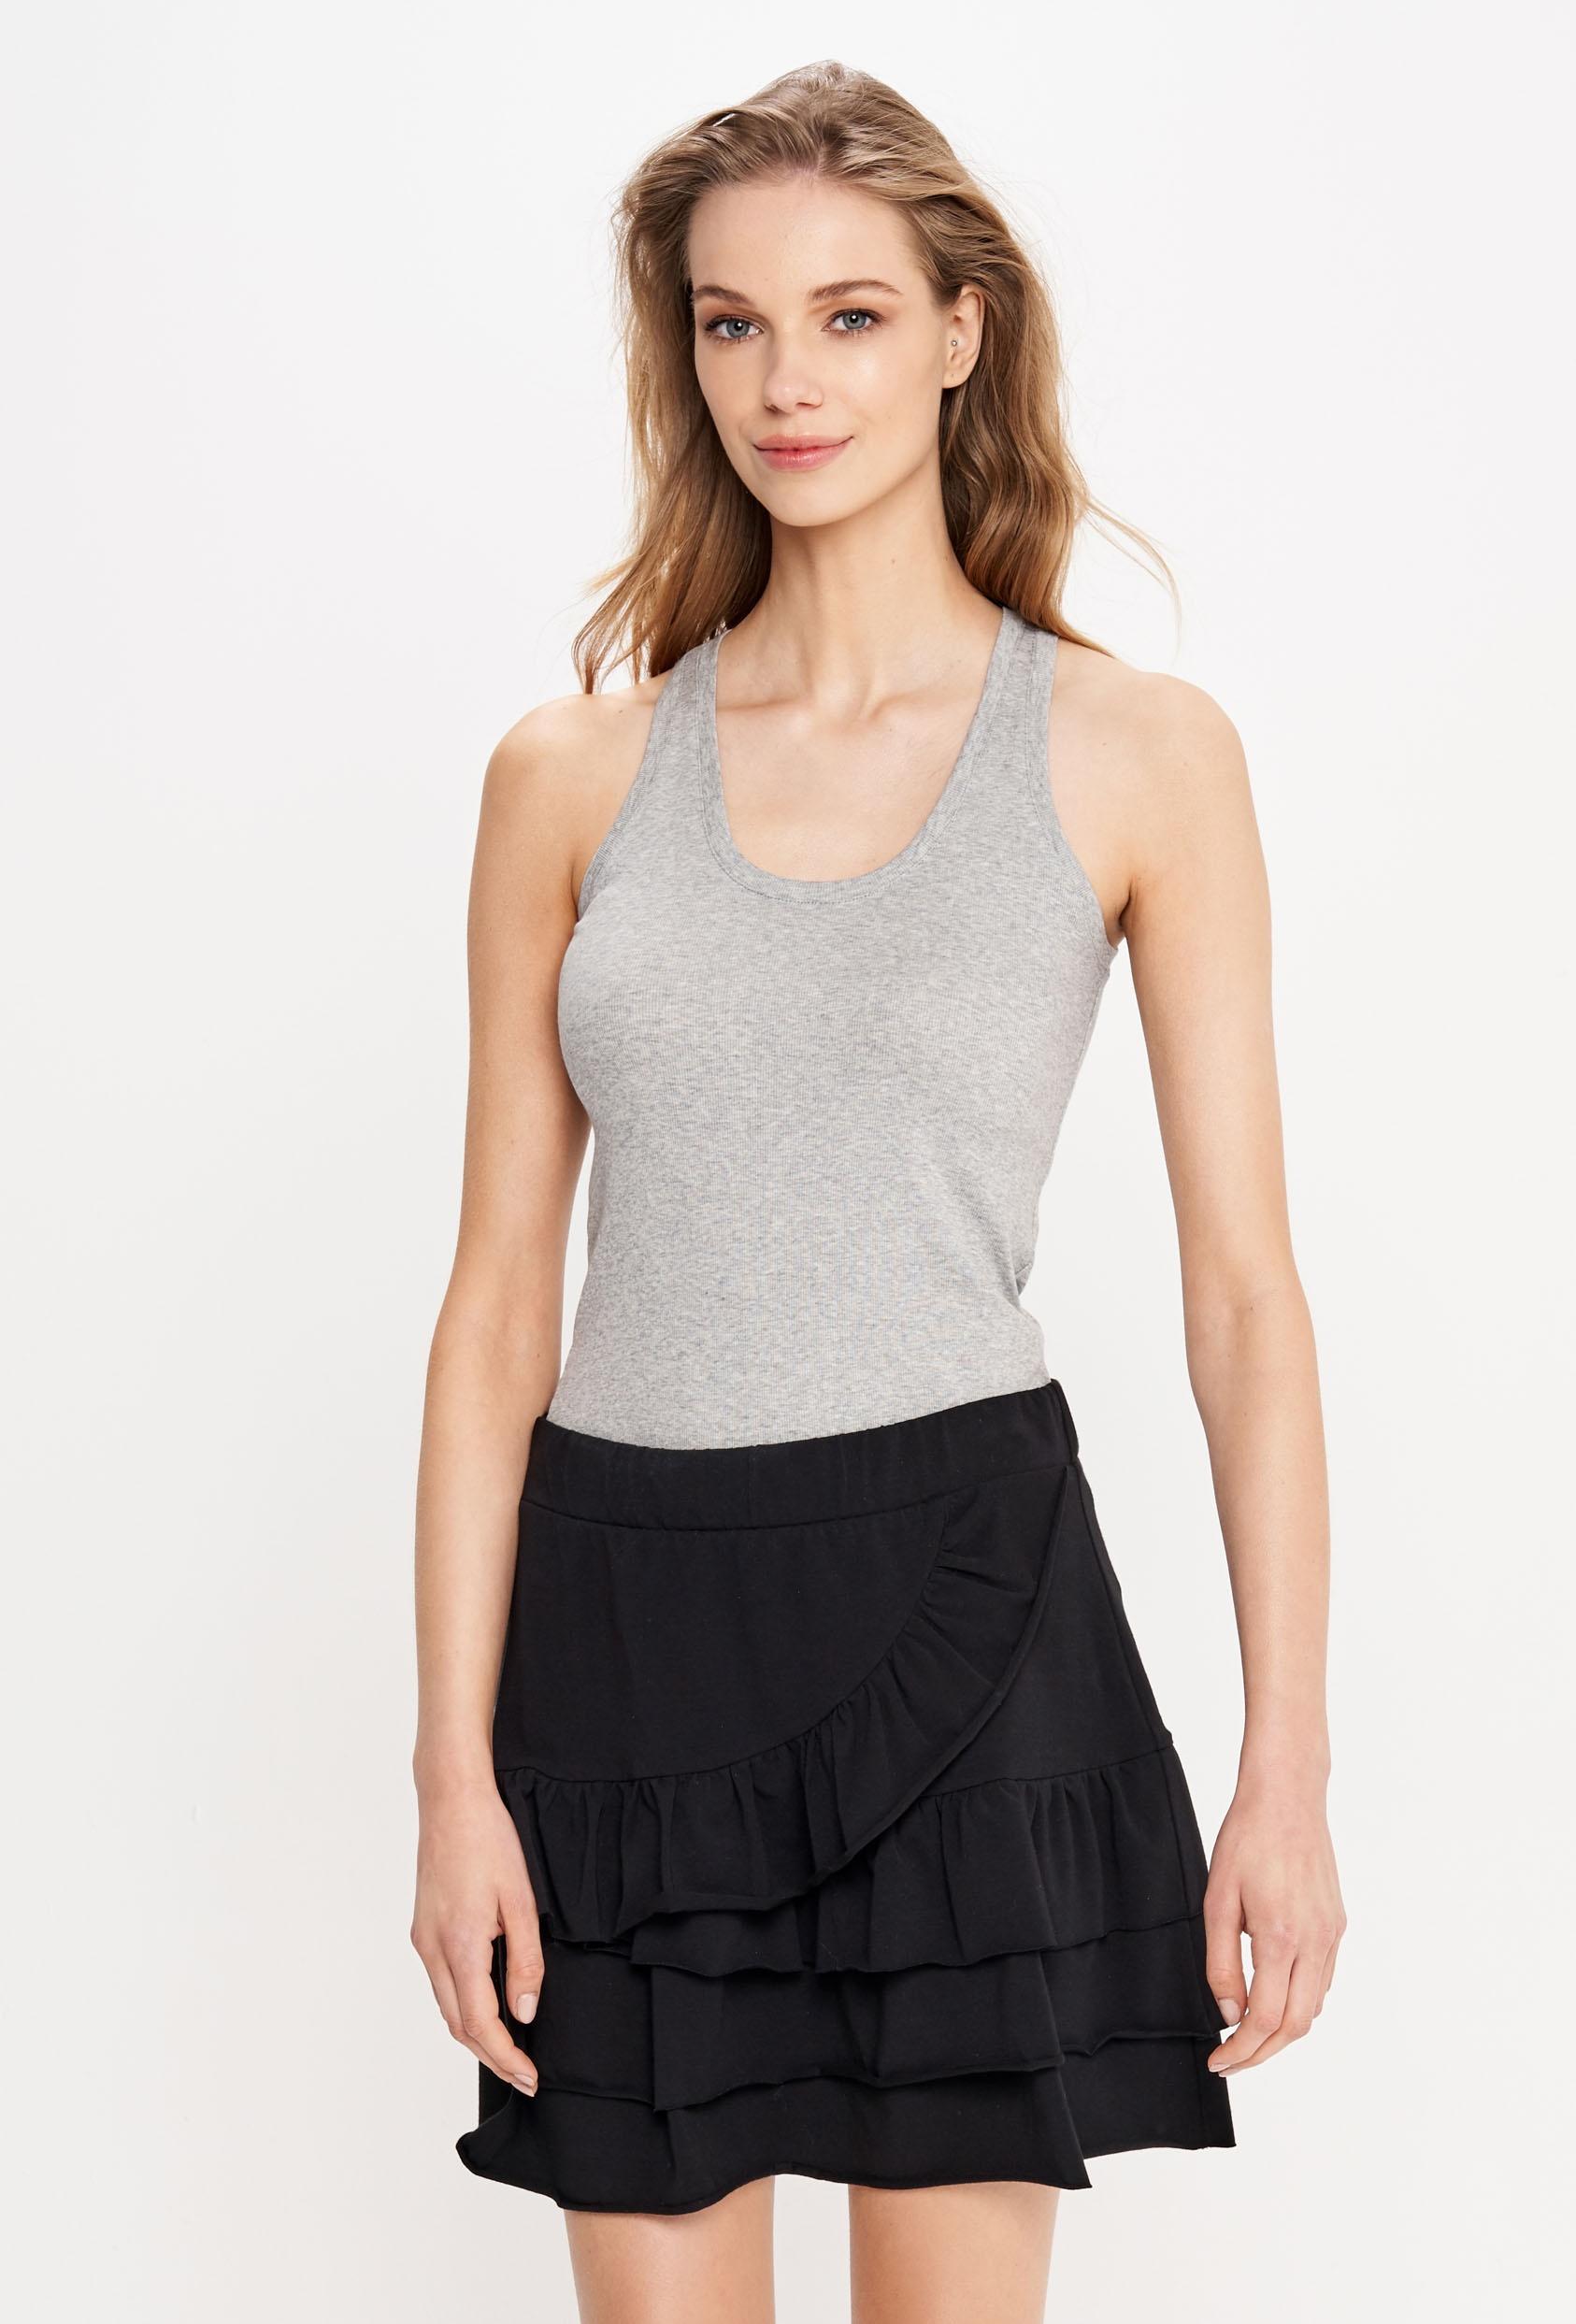 Spódnica mini KLOSS SKIRT czarna